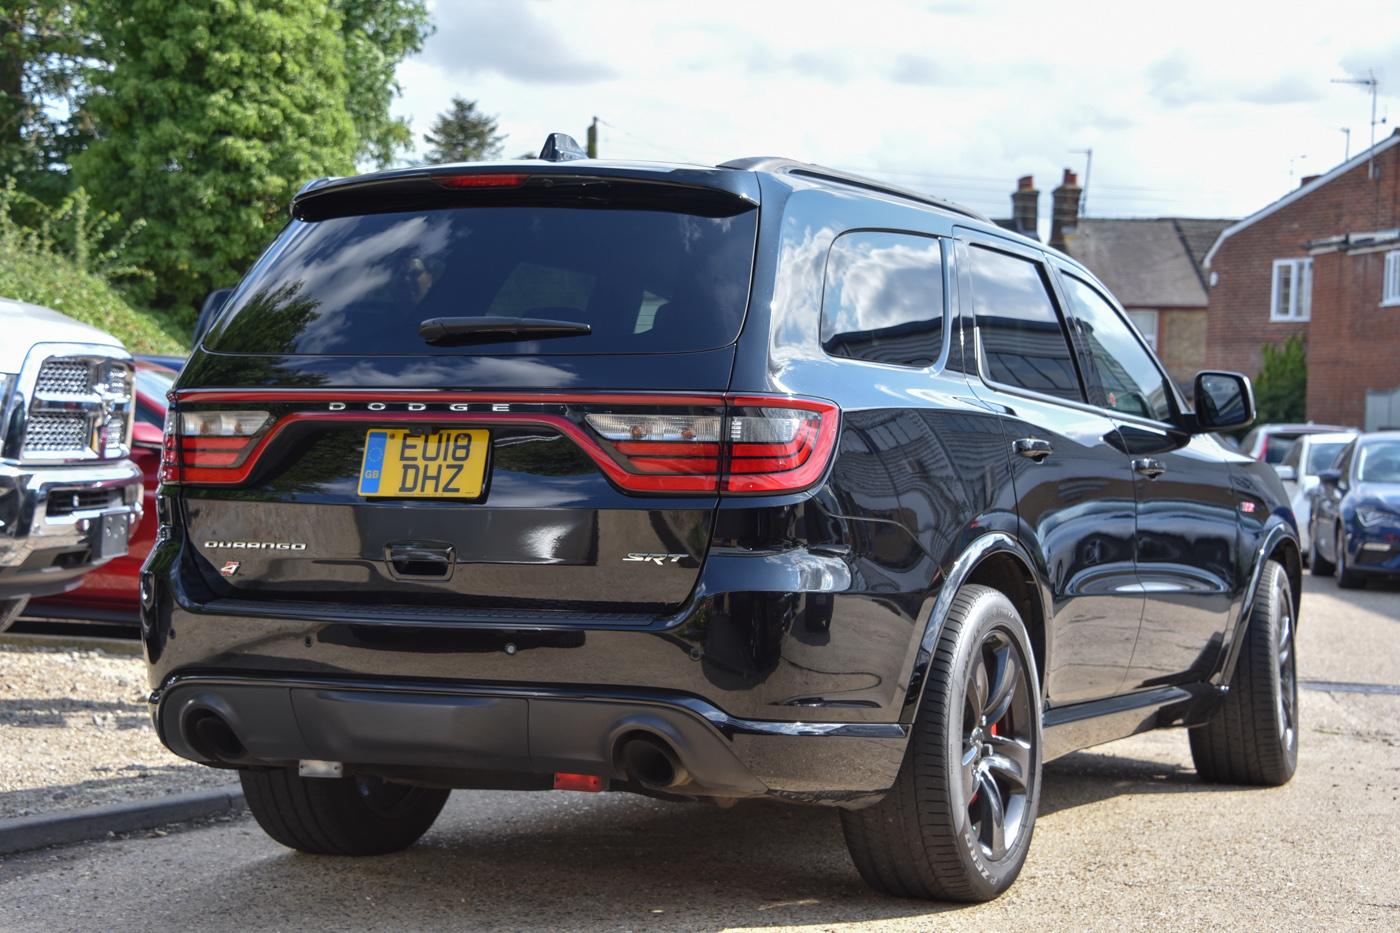 Durango SRT8 for sale UK